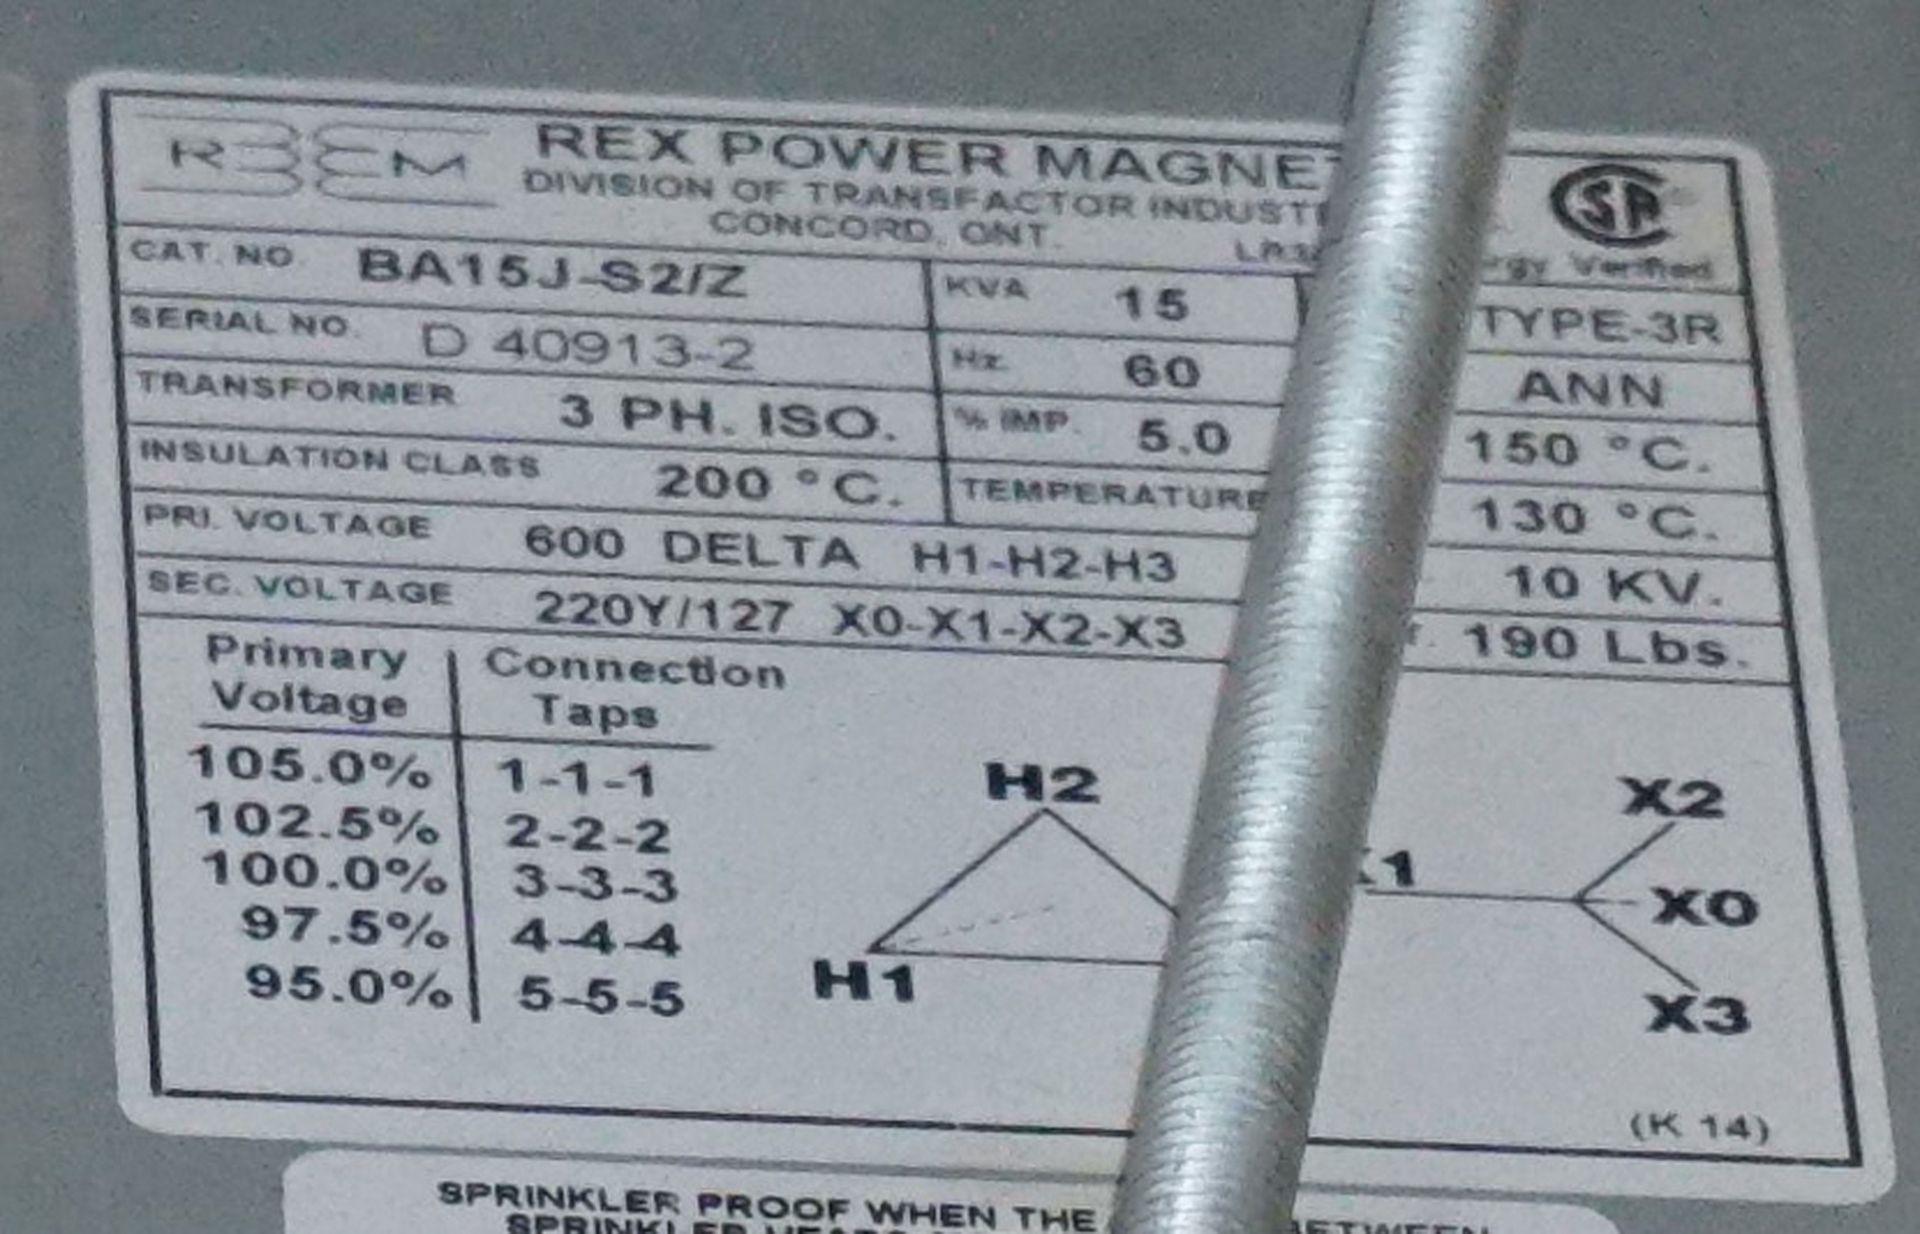 Lot 2 - REX POWER TRANSFORMER 15 KVA, 600HV-220Y/127LV, 3 PHASE (CI)